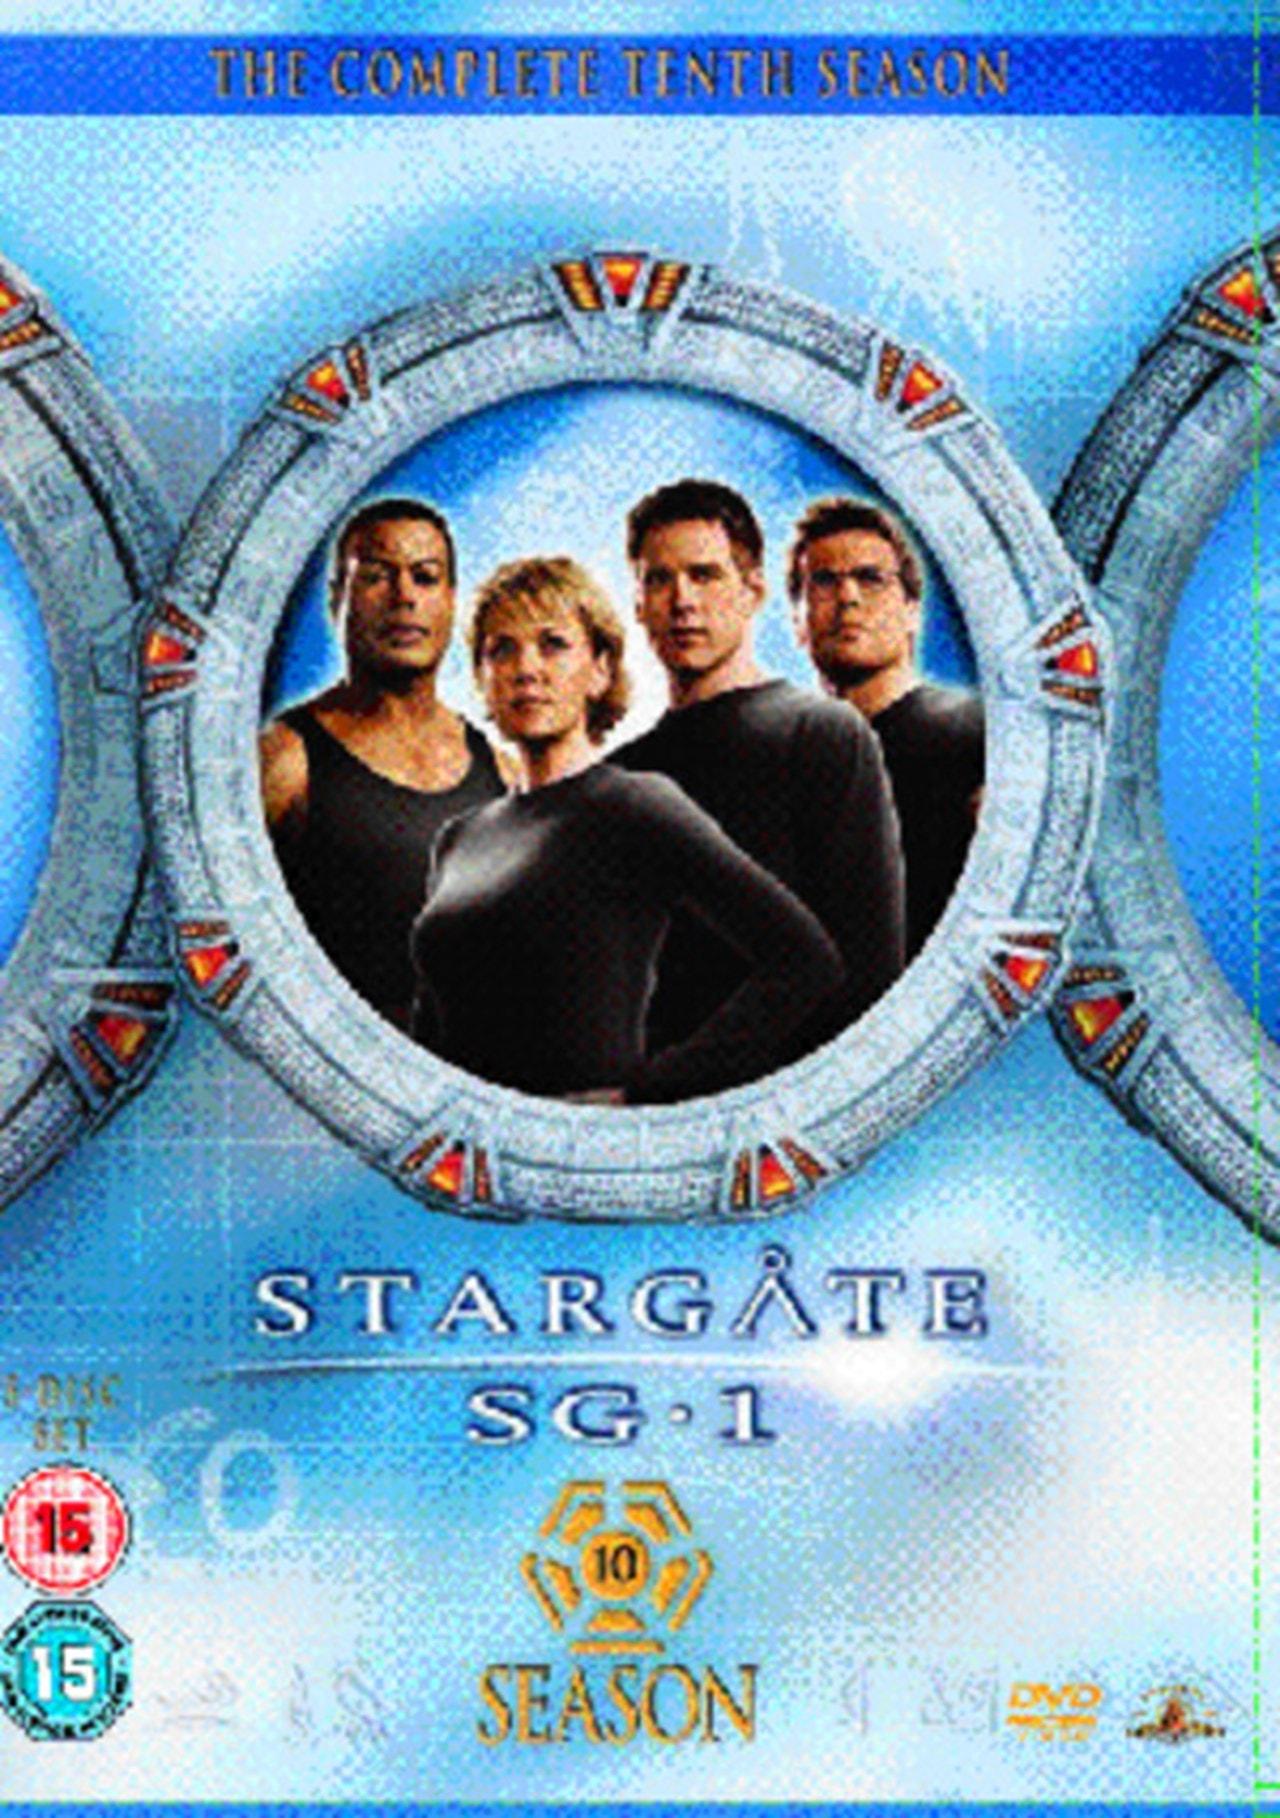 Stargate SG1: Season 10 - 1